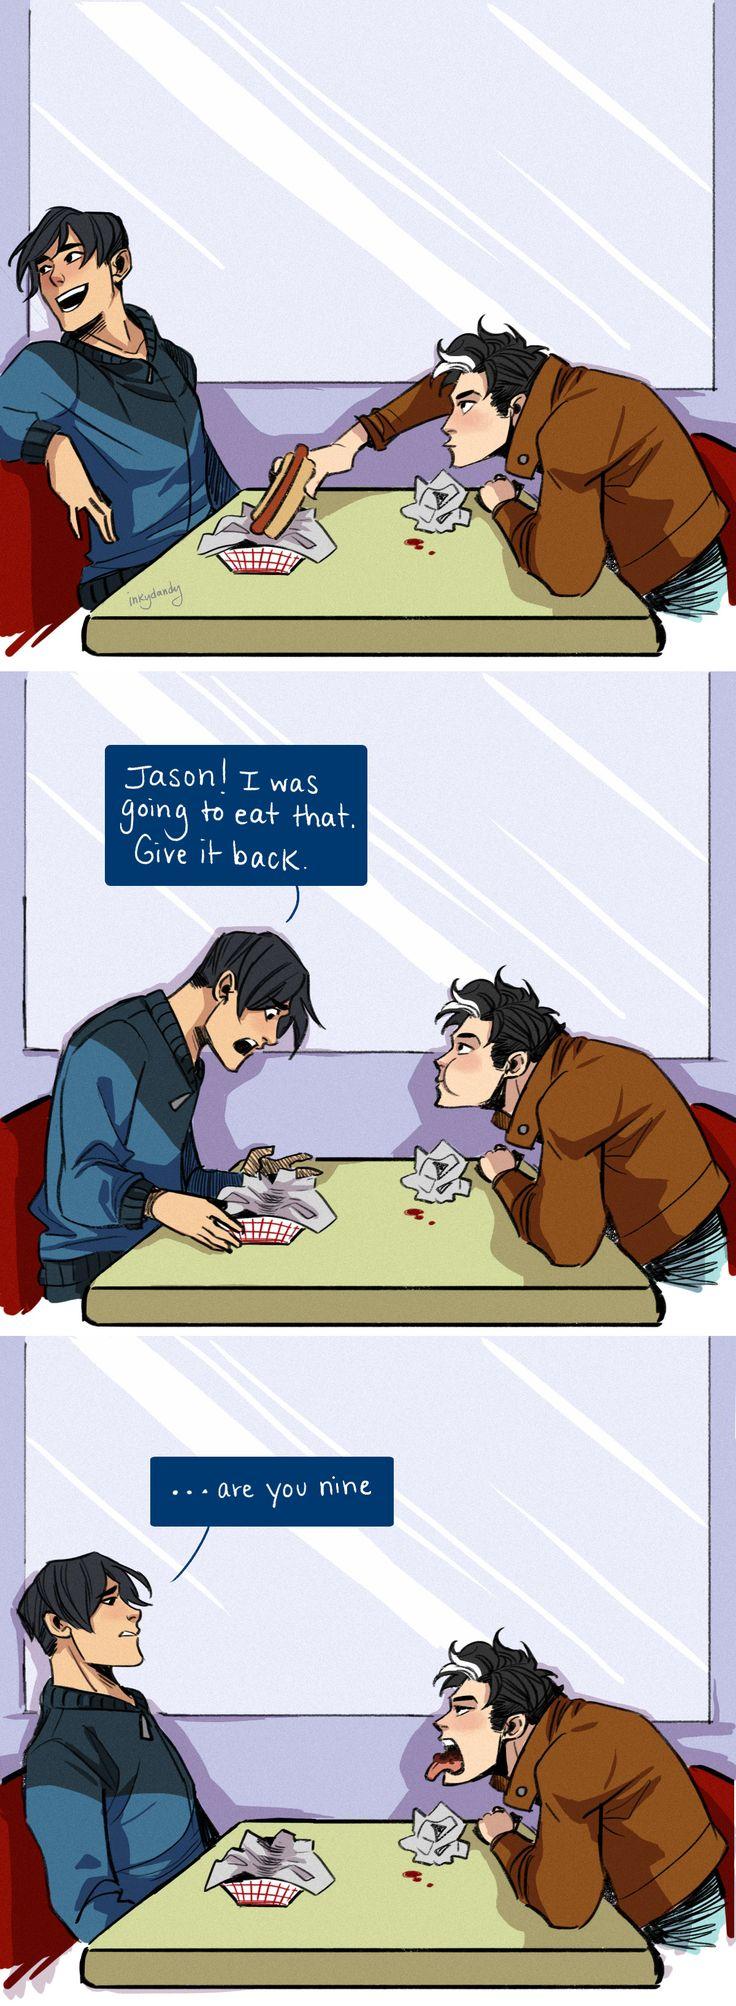 http://inkydandy.tumblr.com/tagged/dc-comics